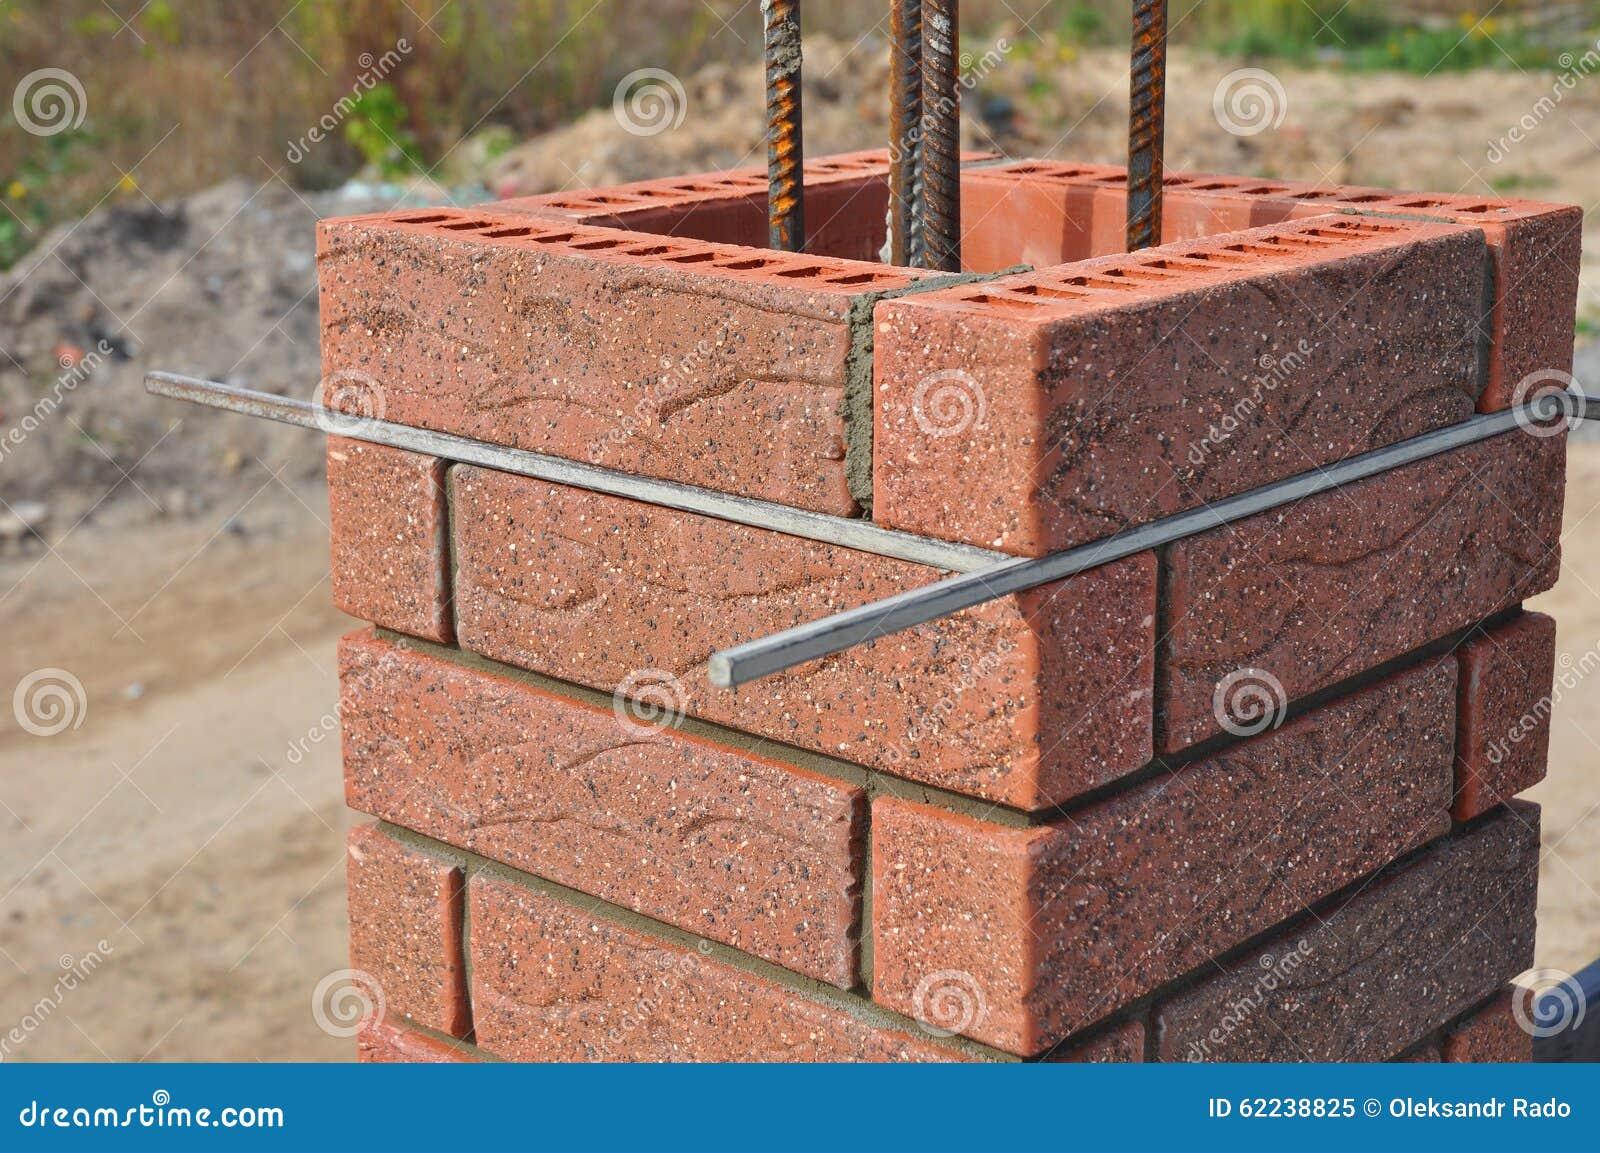 Lay Bricks Stock Images - Image: 17474684